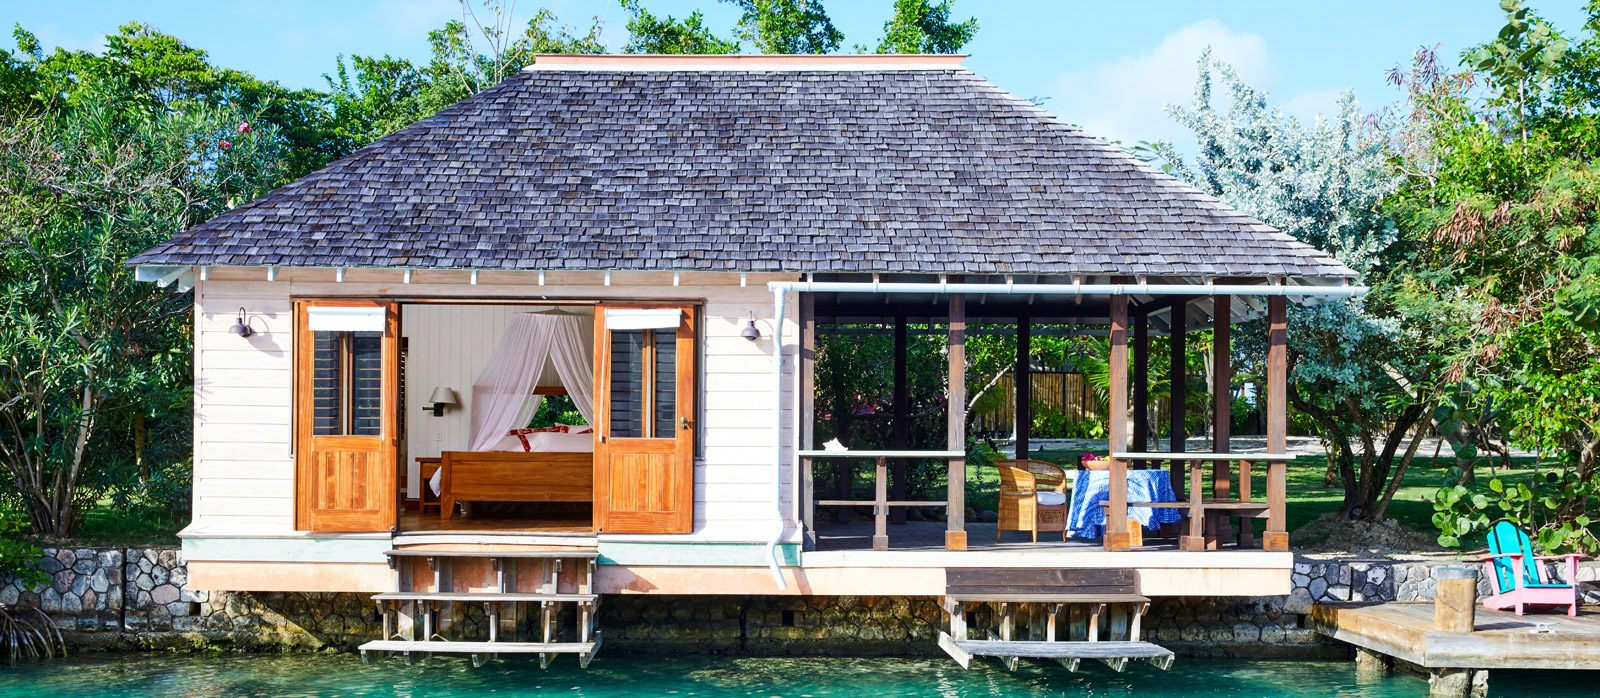 GoldenEye Resort Jamaica Vacation Villa Cottage Or Hut Accomodations